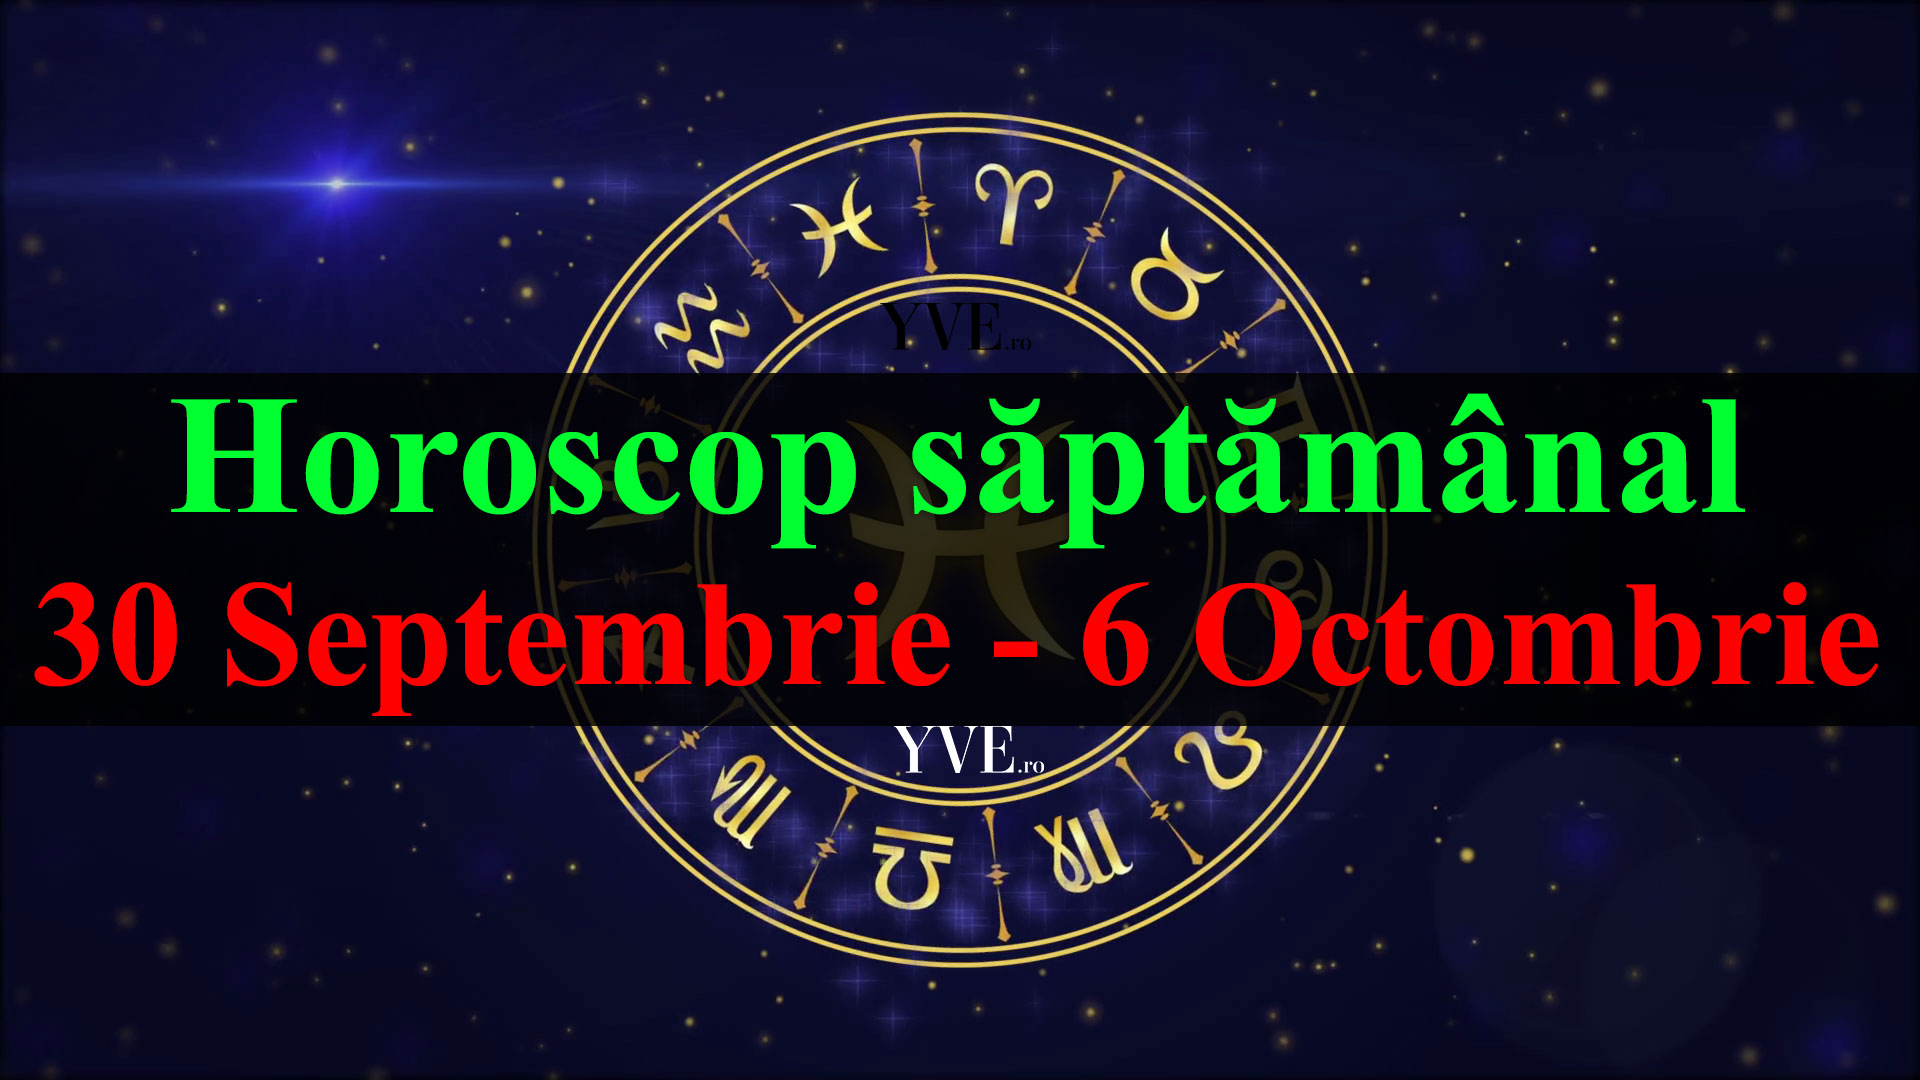 Horoscop saptamanal 30 Septembrie - 6 Octombrie 2019